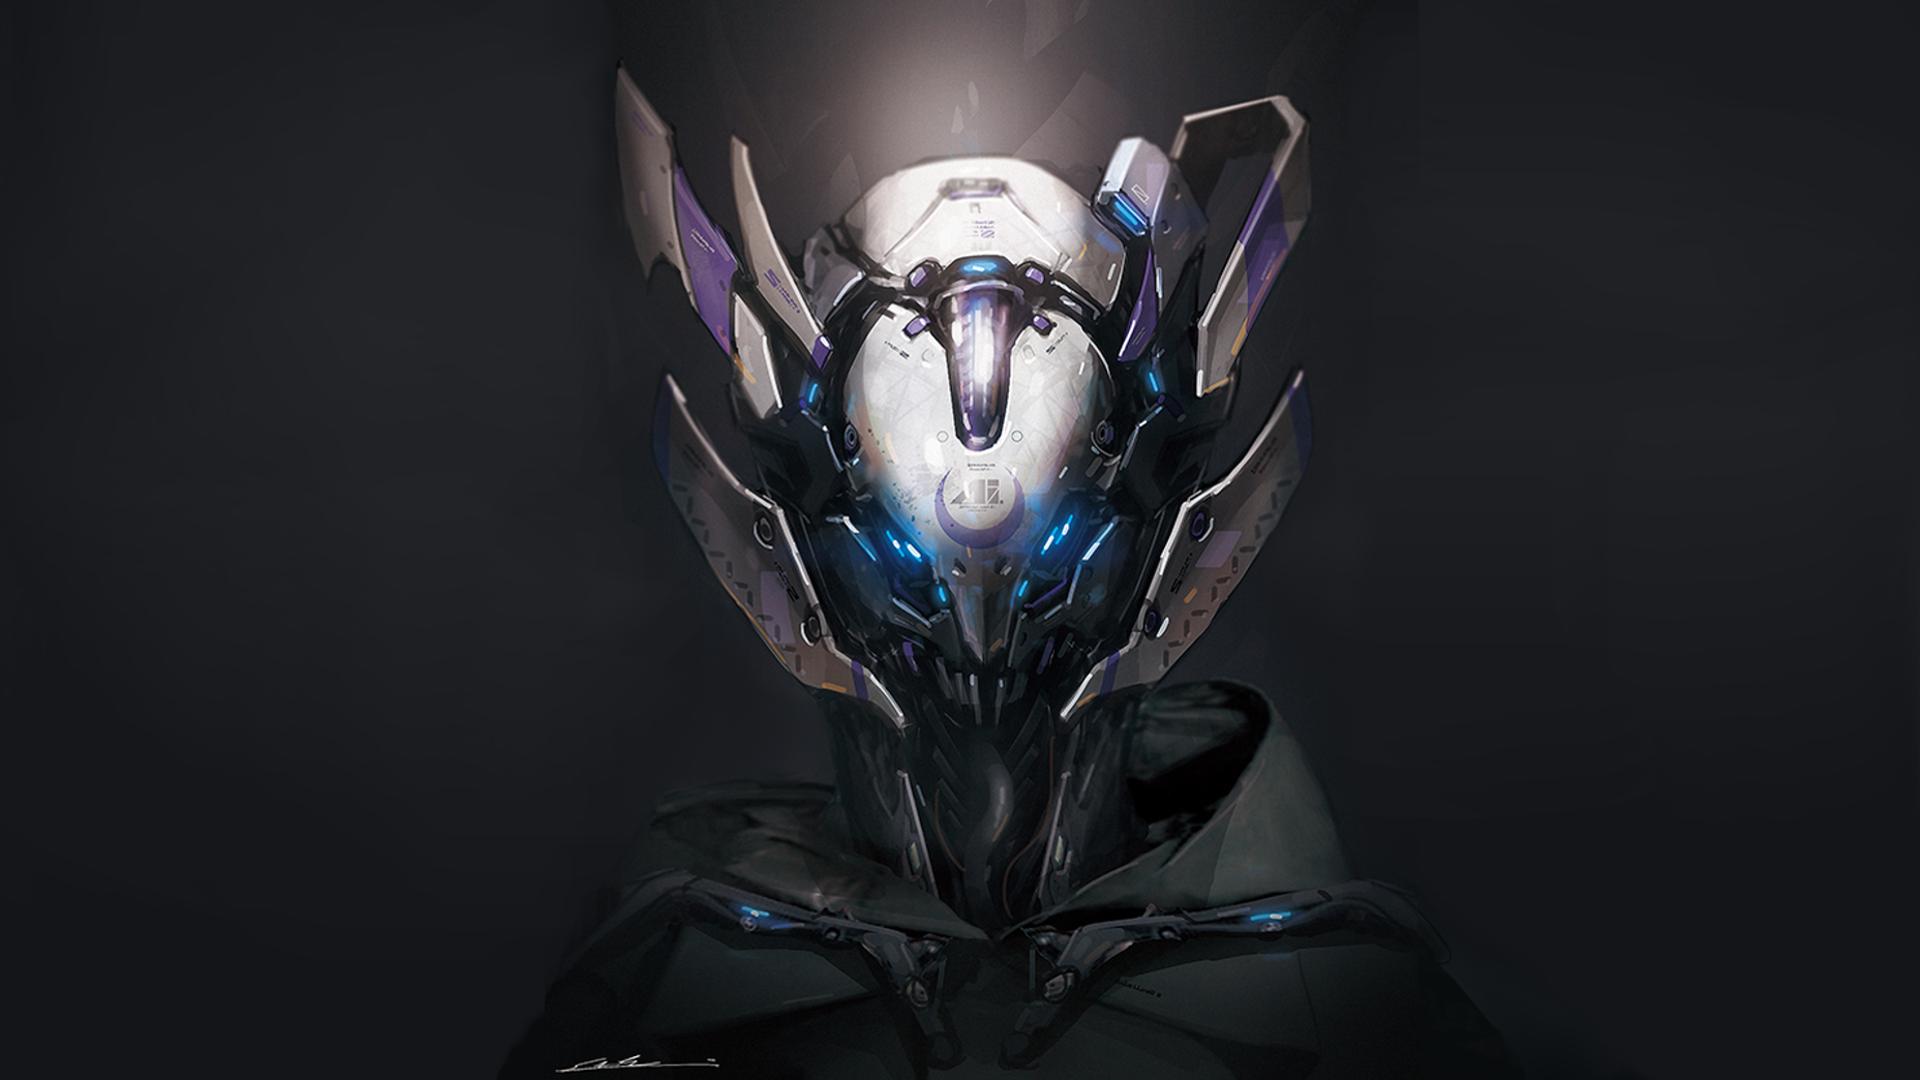 General 1920x1080 digital art artwork android robot robot futuristic science fiction